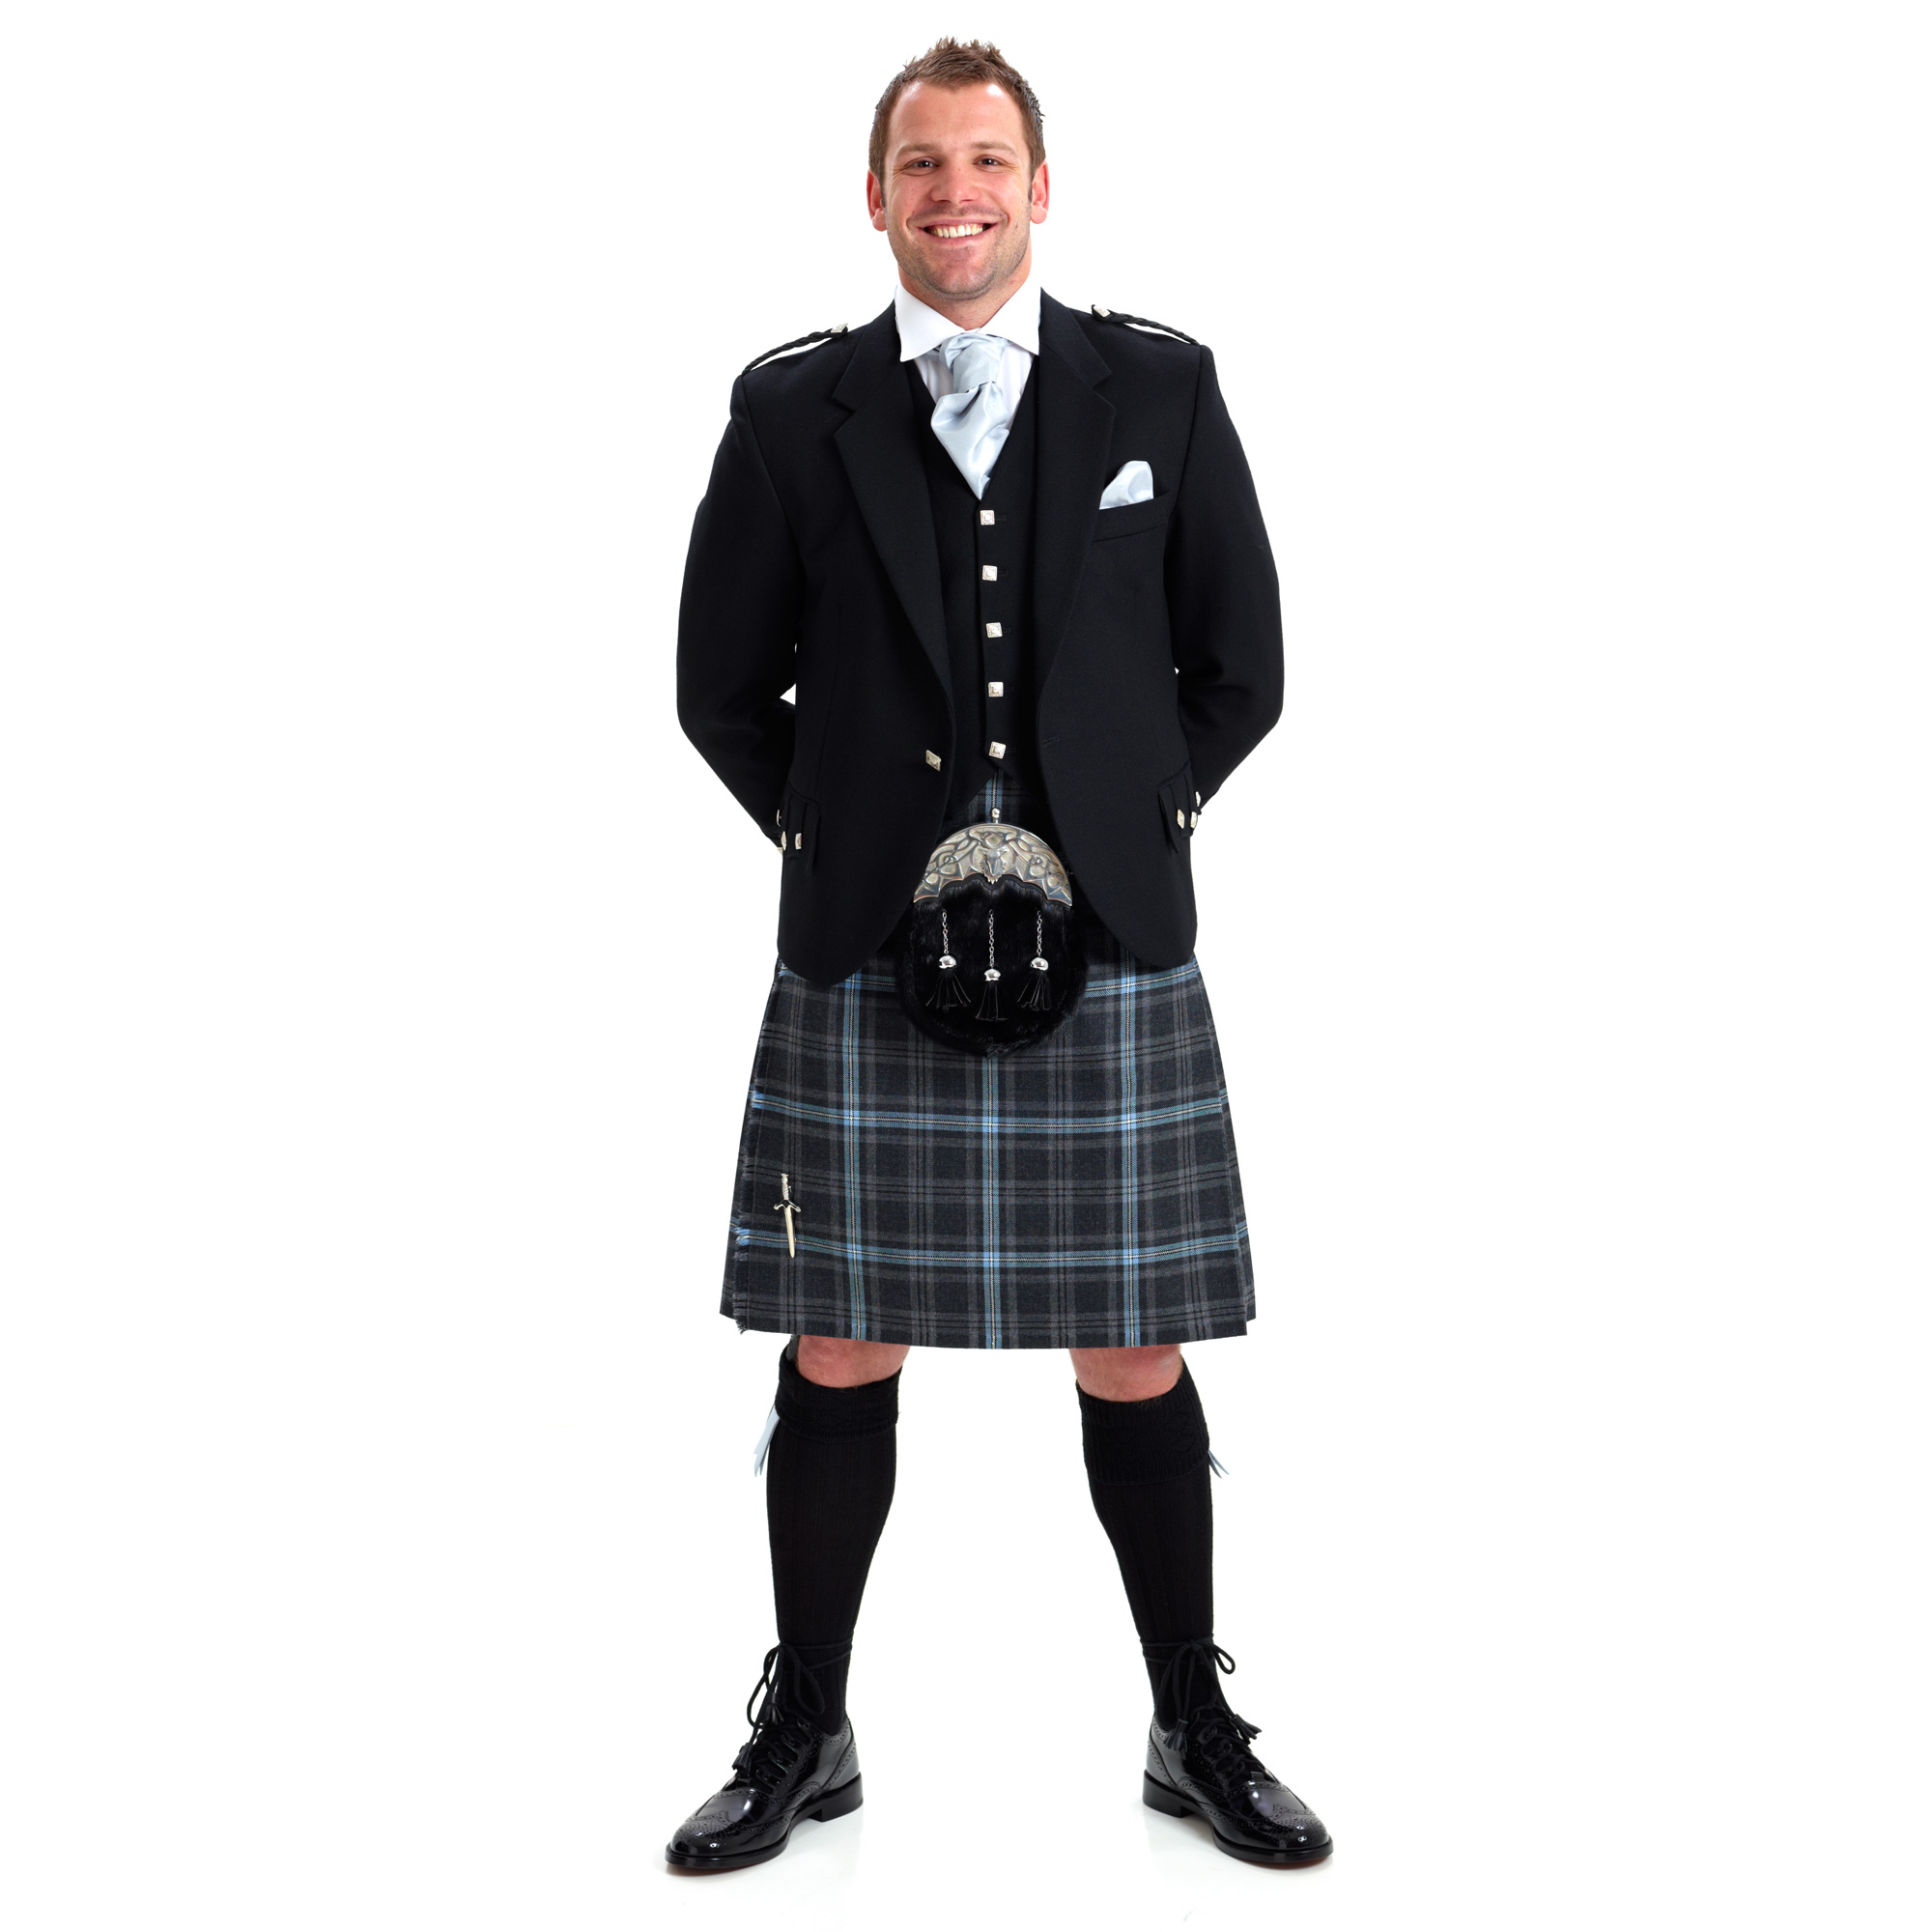 Waistcoat With Yard Kilt 5 Argyle Jacket 8 Button Outfit xvwf8Iq